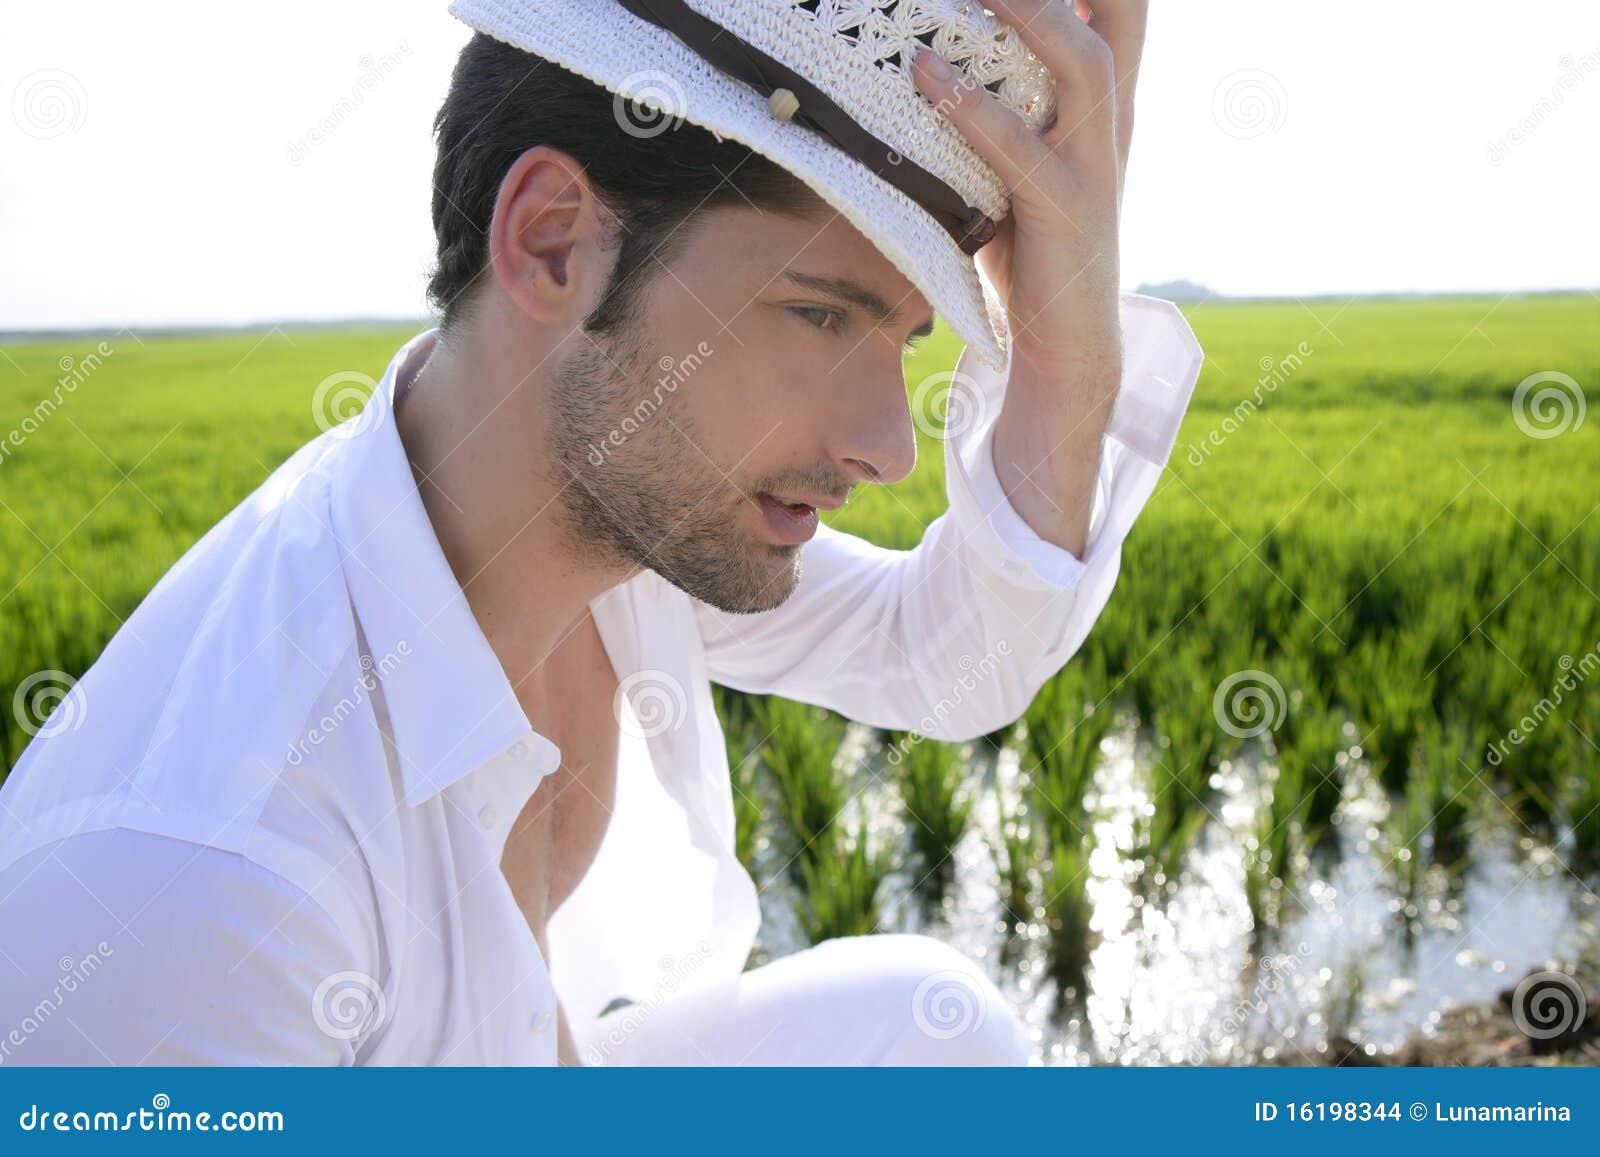 Mediterranean Man Portrait White Hat Inmeadow Stock Images ...